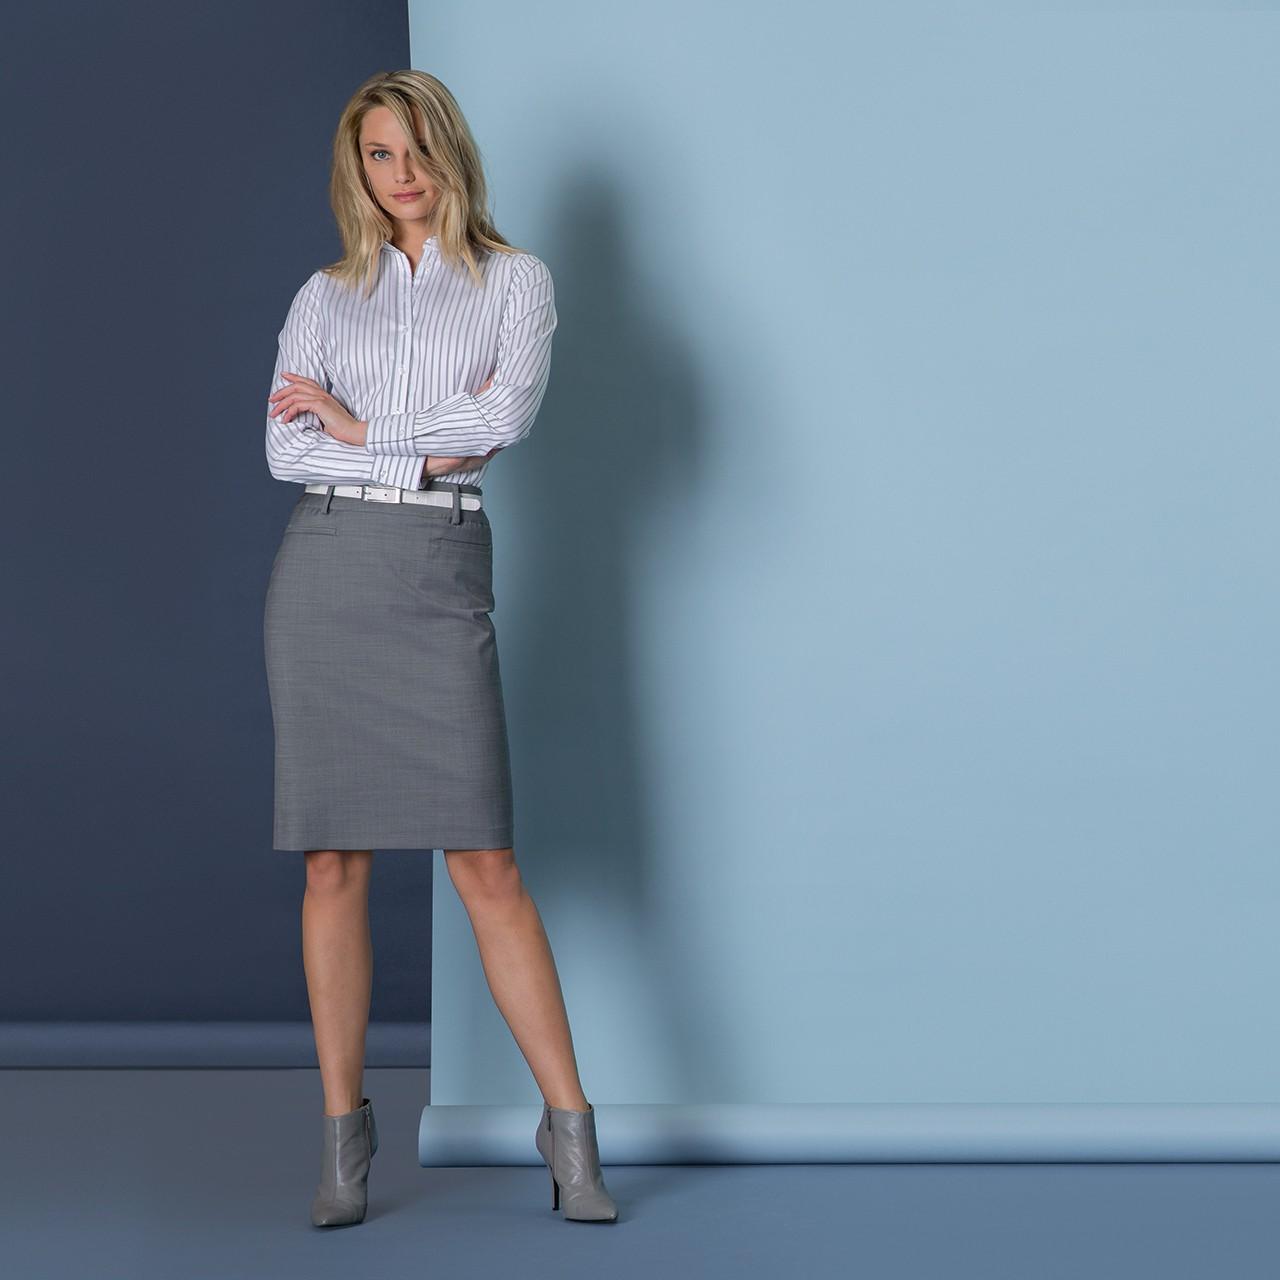 Damen Stiftrock Modern Regular Fit Greiff® | bedrucken, besticken, bedrucken lassen, besticken lassen, mit Logo |